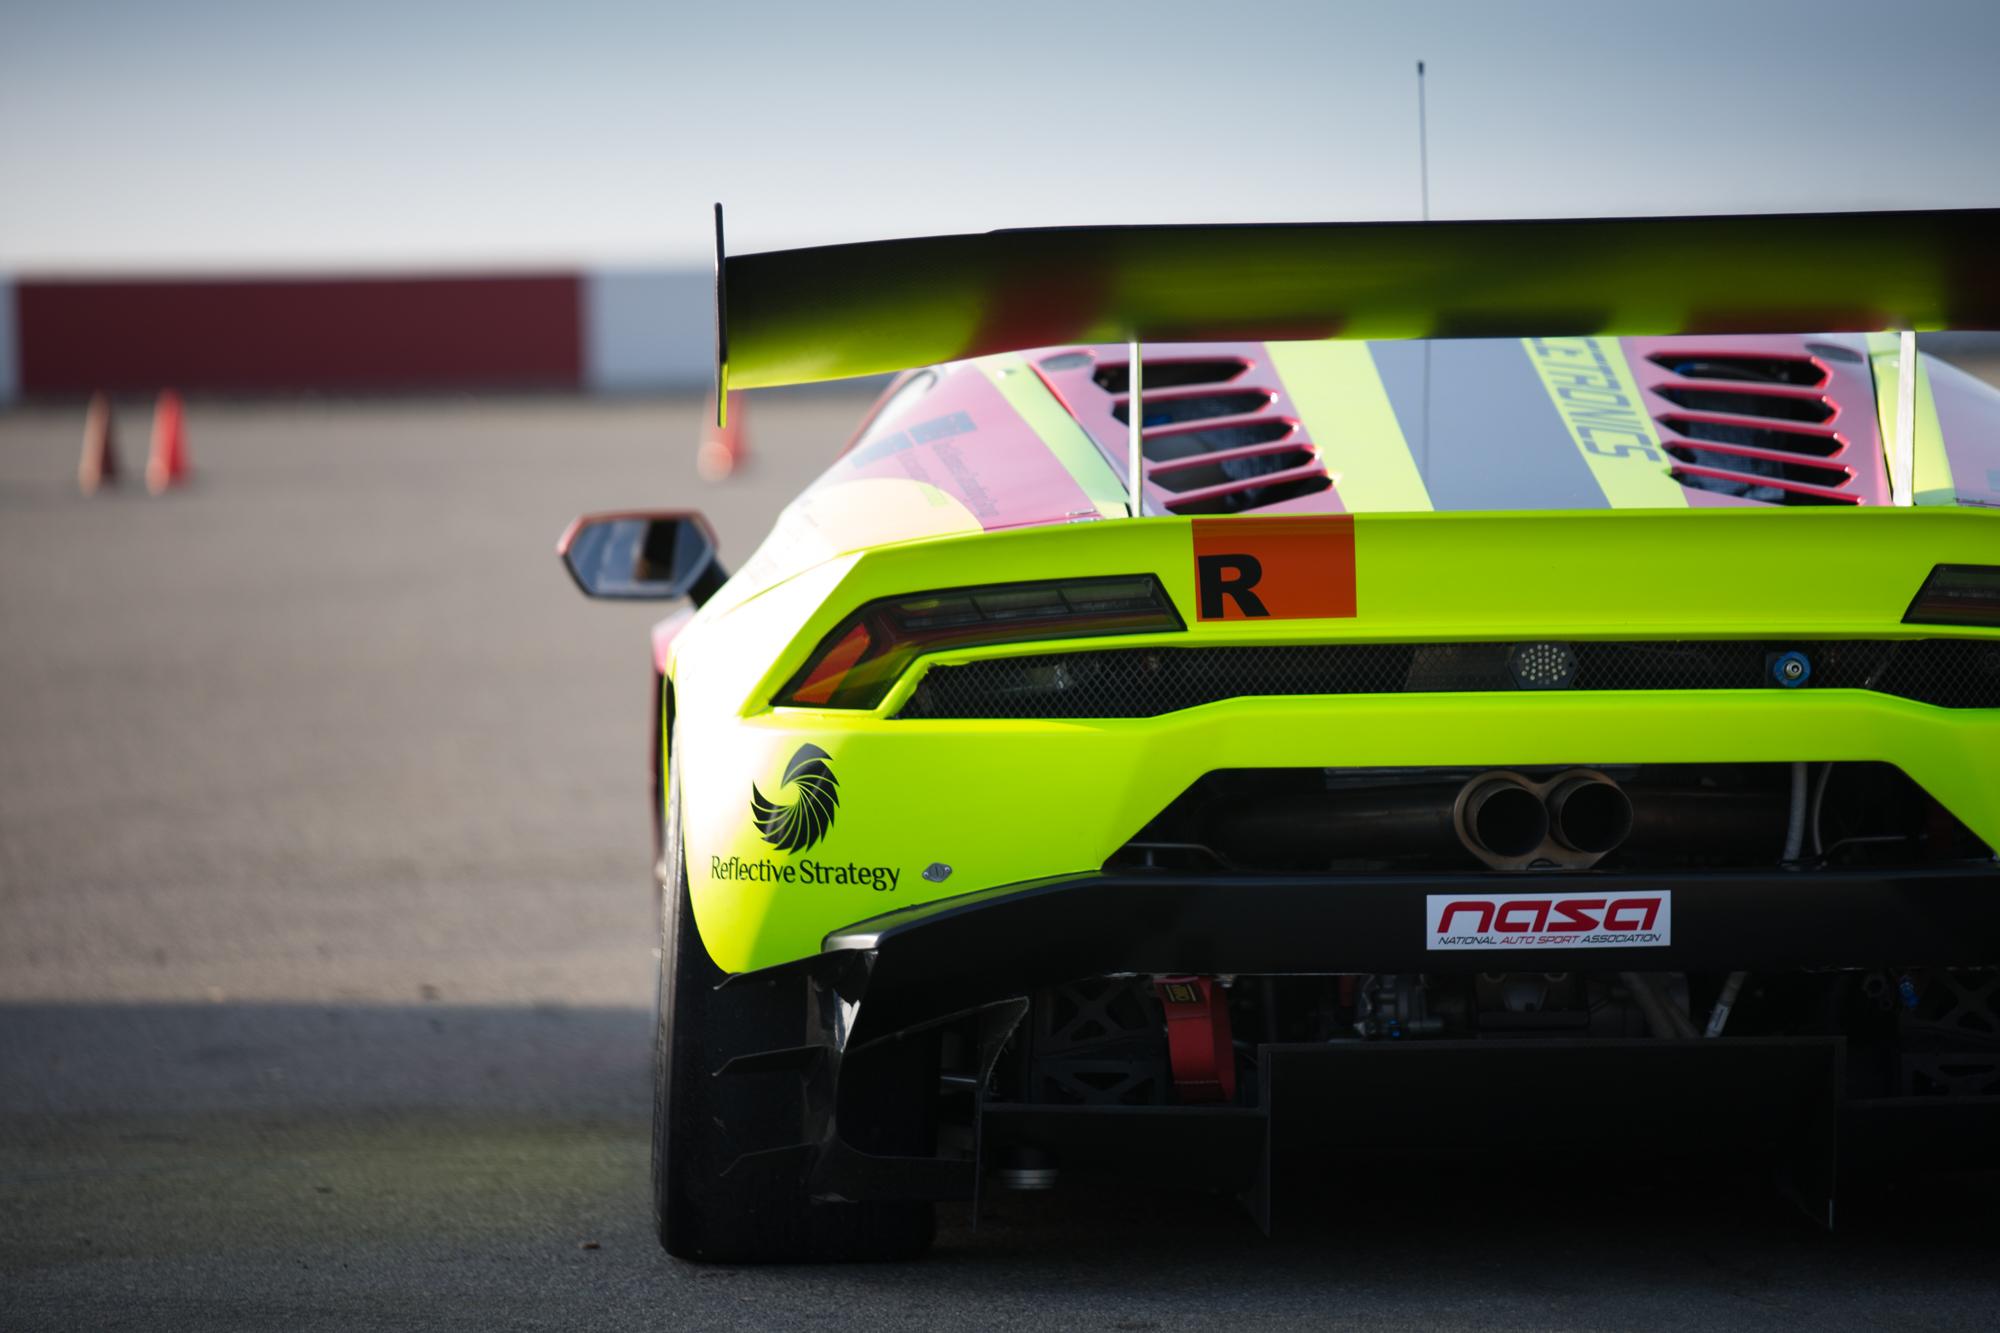 Steven-Racing-20171027-53369.jpg